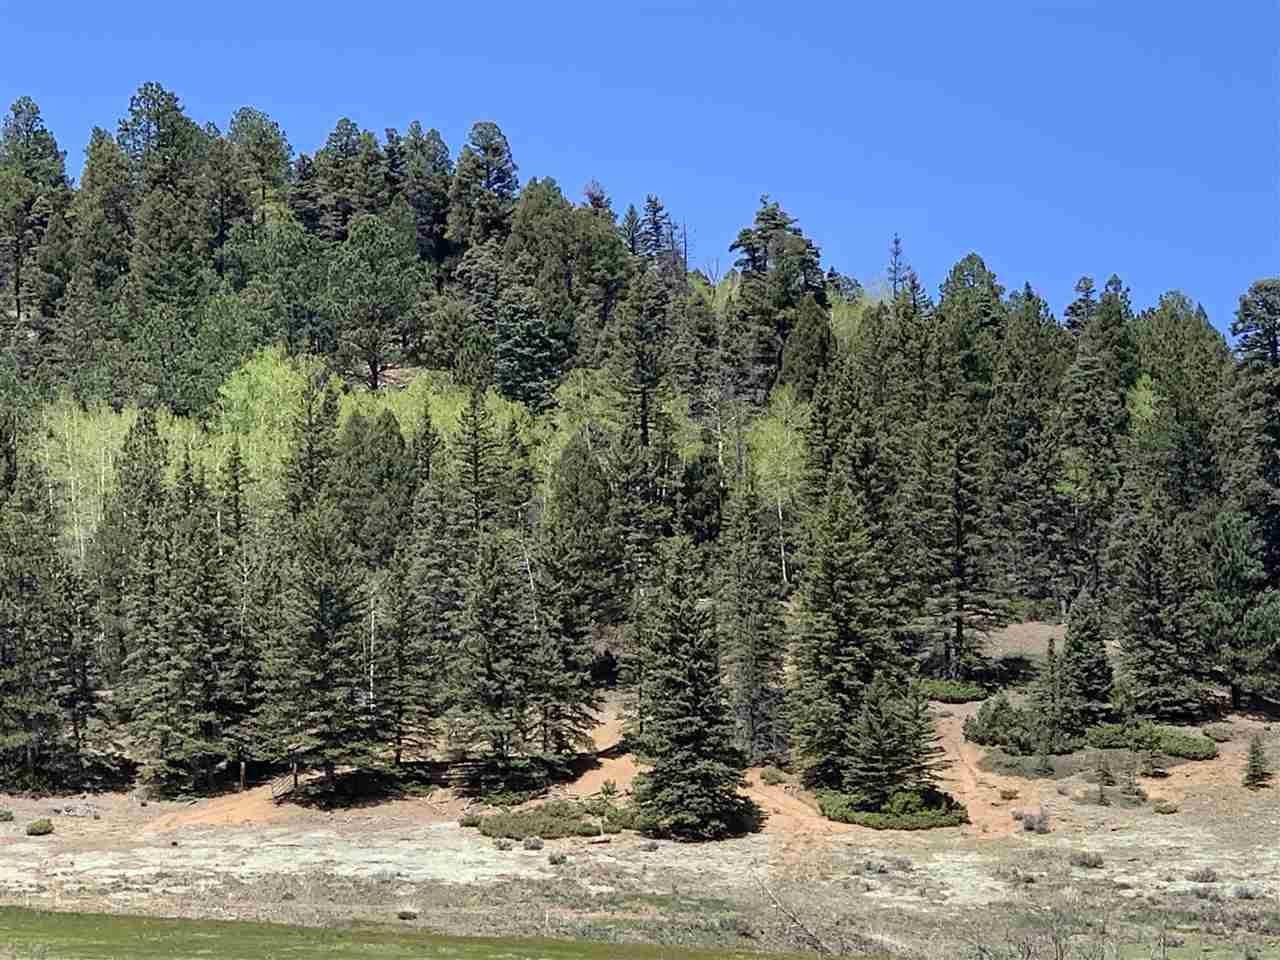 Photo for 0 Valle Escondido Road, Valle Escondido, NM 87571 (MLS # 105091)